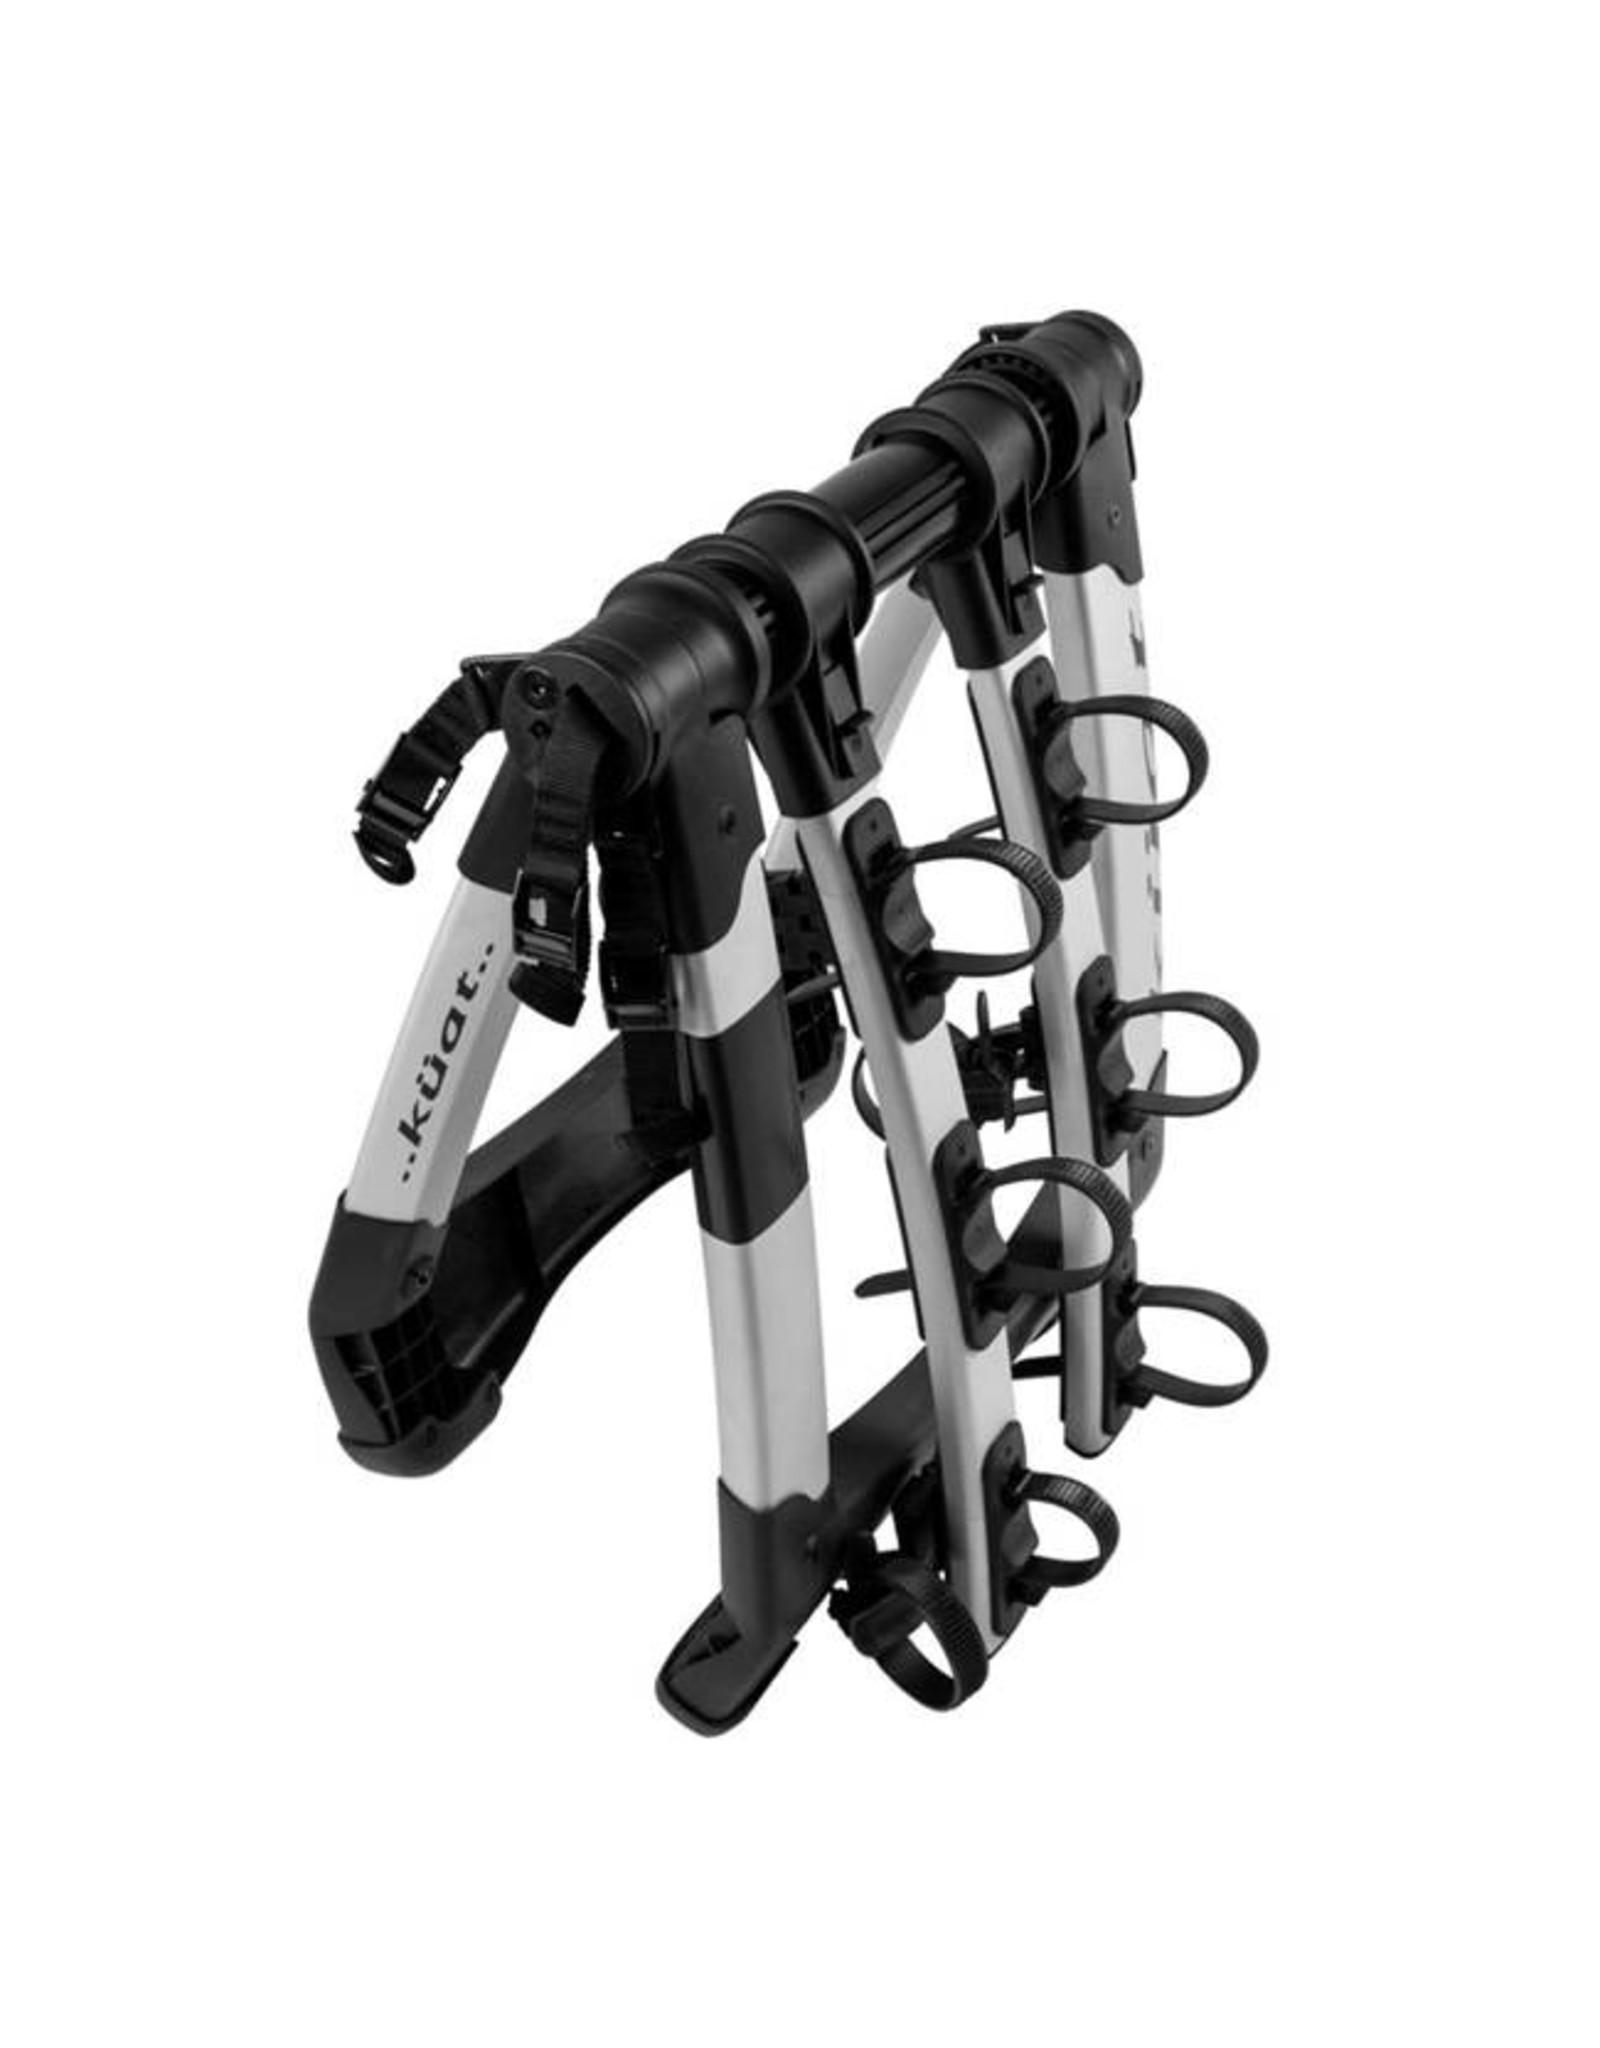 Kuat Kuat Highline Trunk Rack: 3 Bike Silver/Black